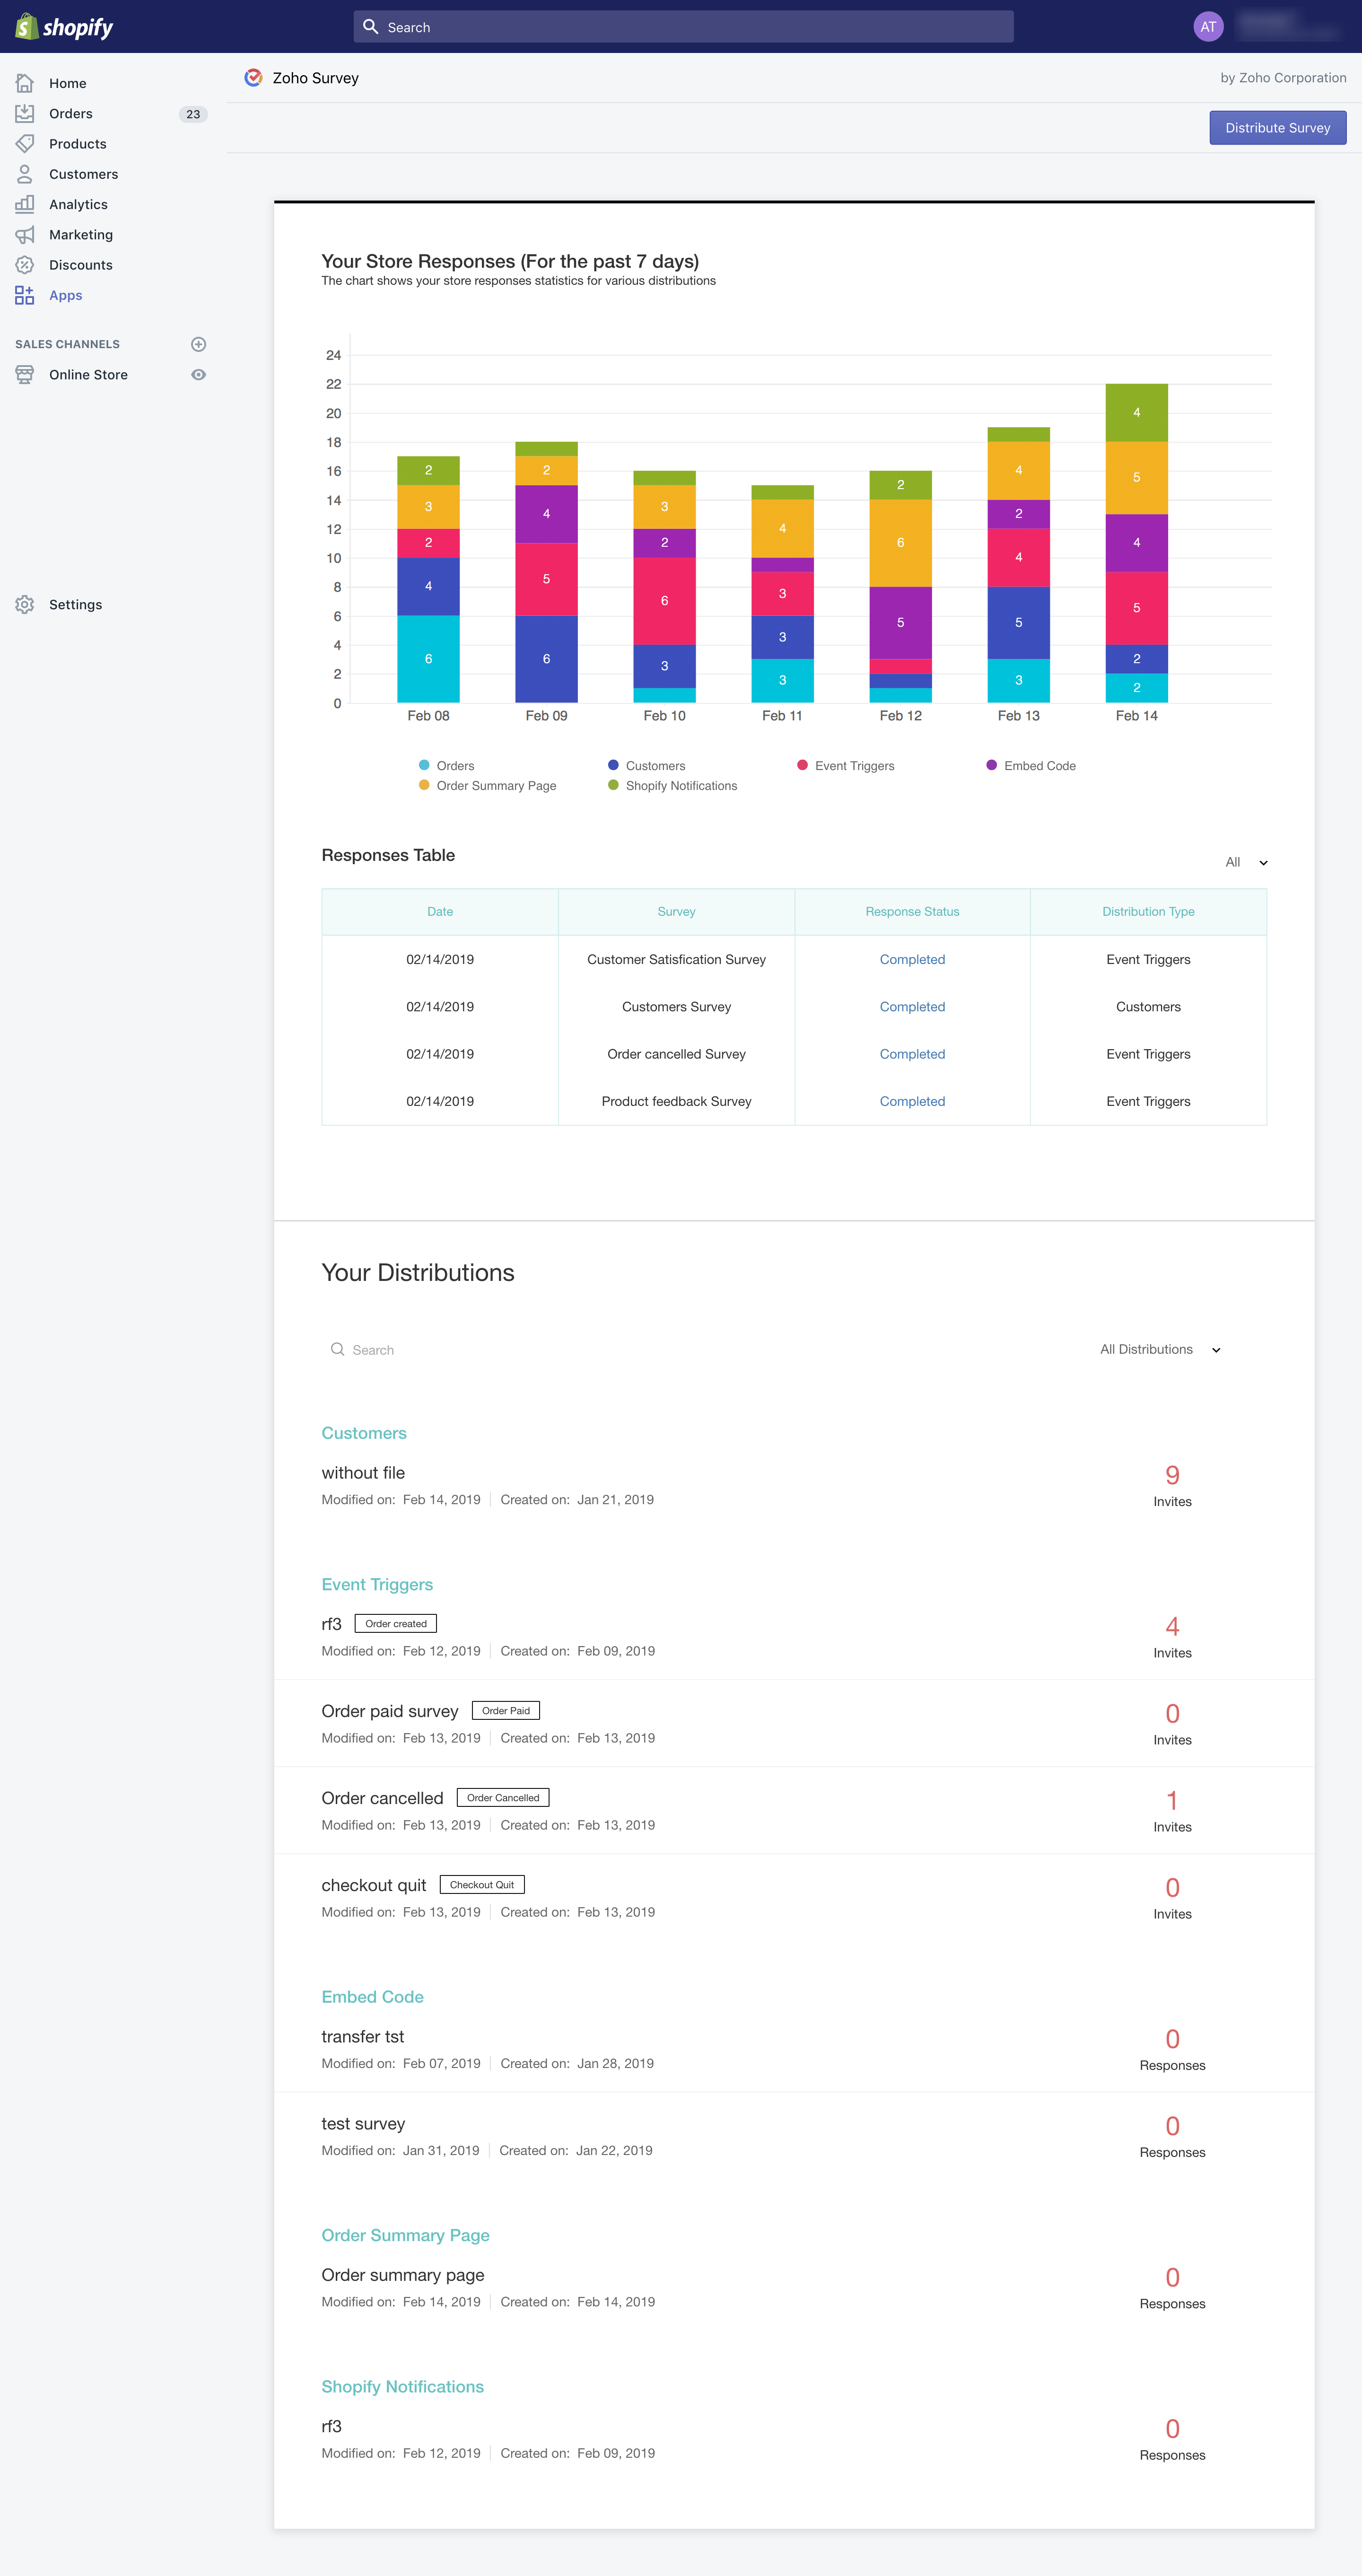 Zoho Survey Shopify response chart table